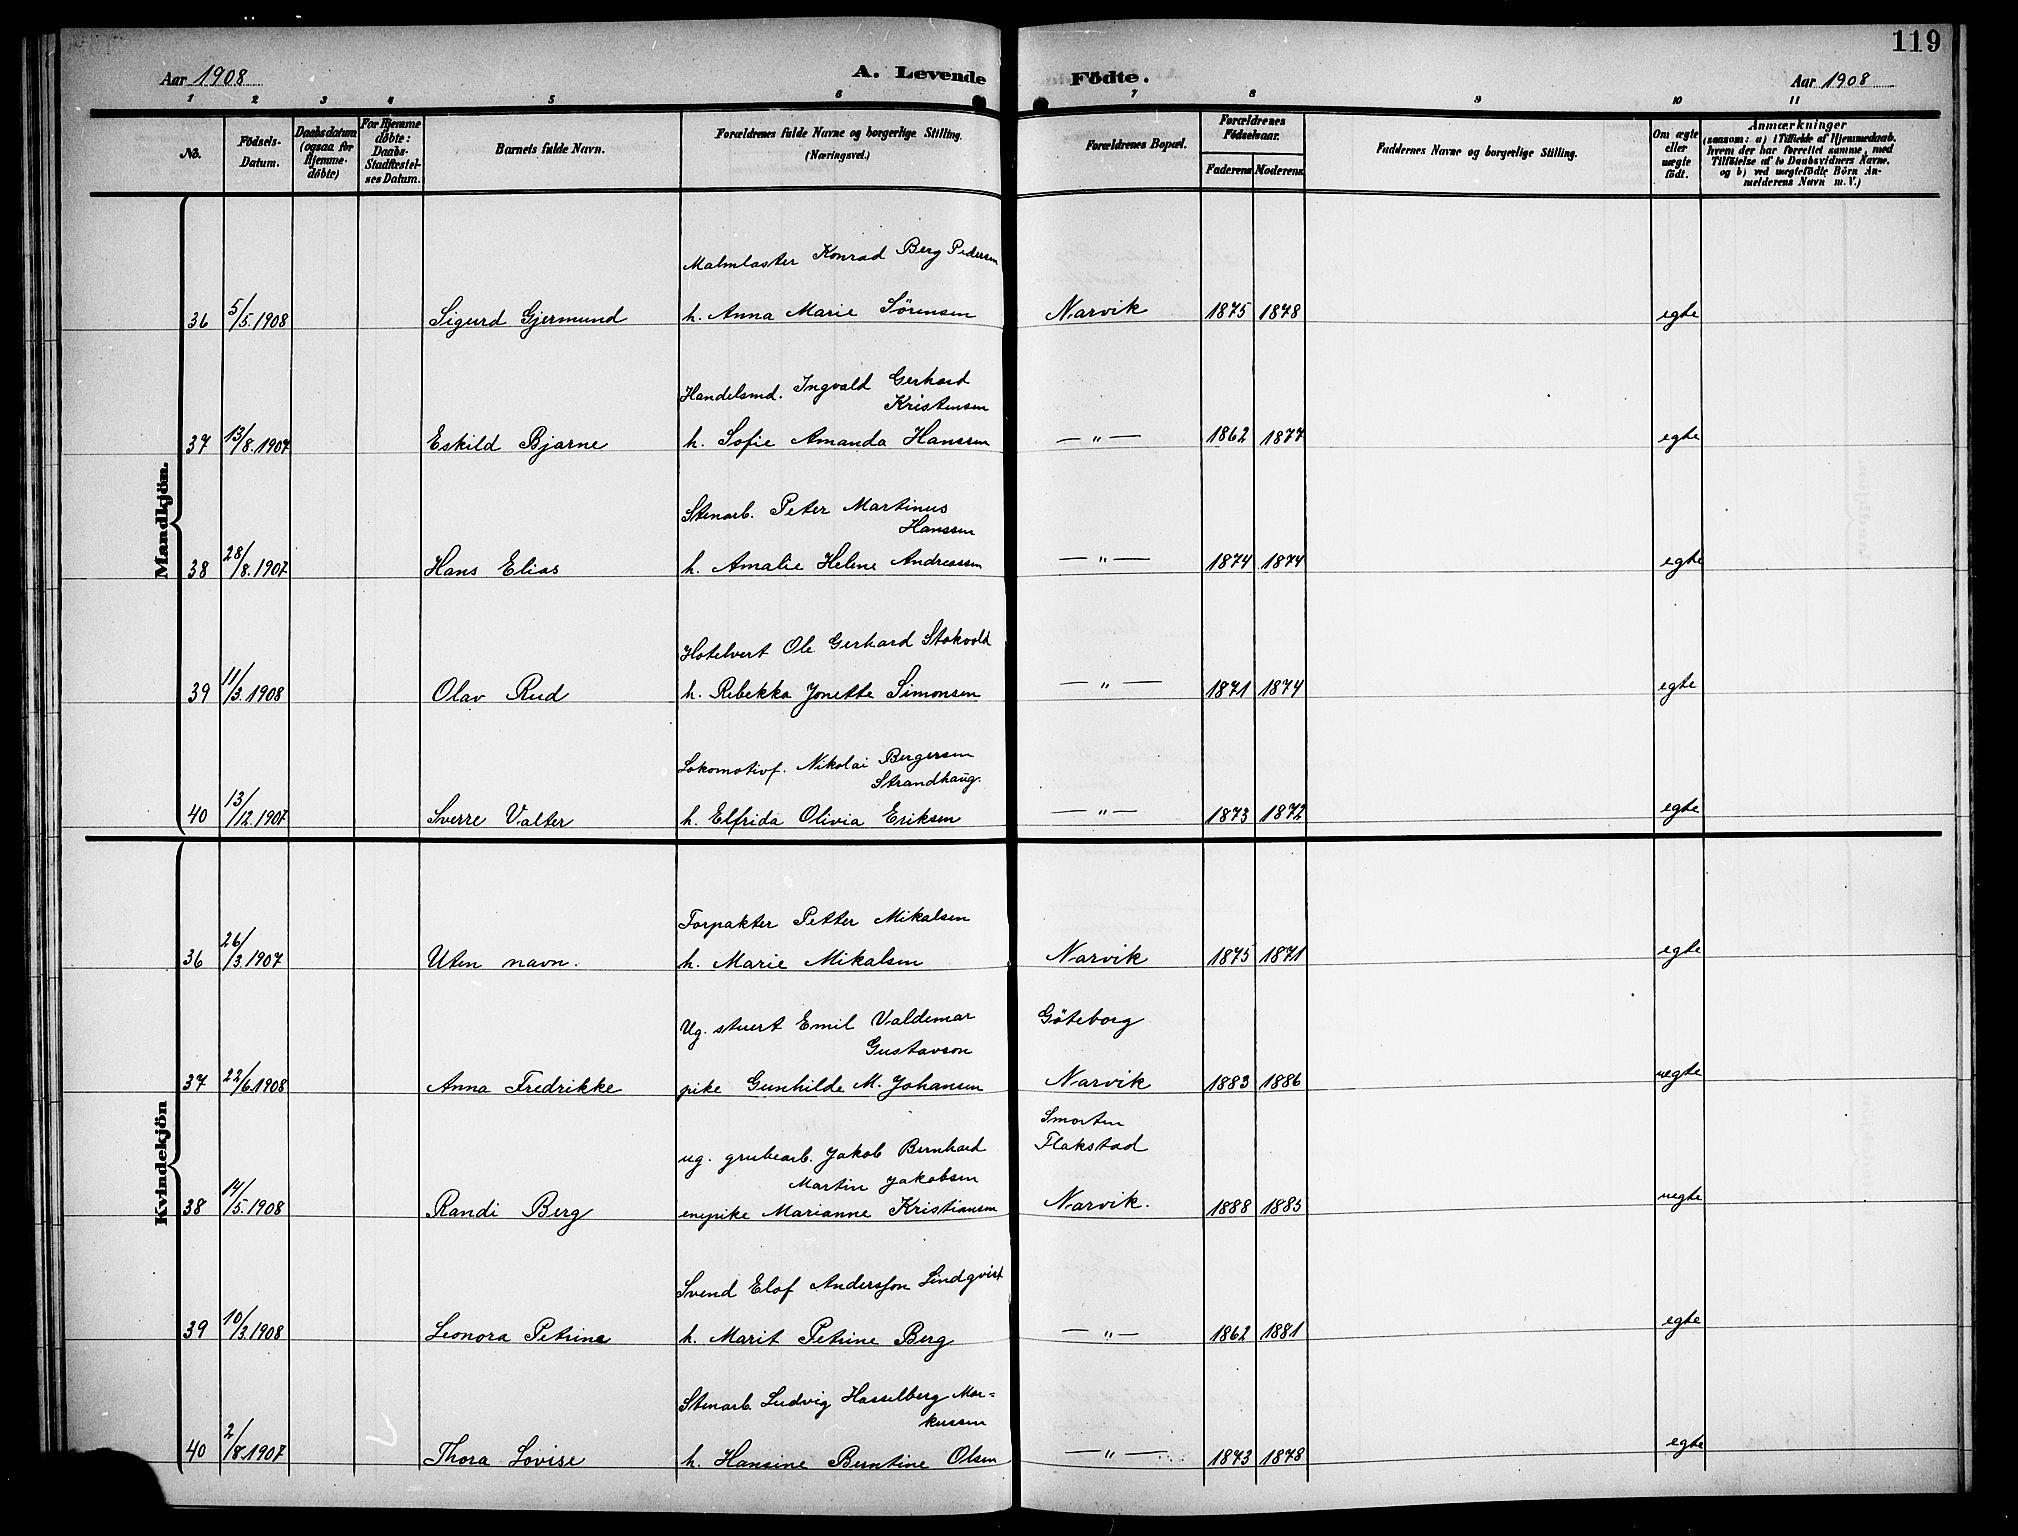 SAT, Ministerialprotokoller, klokkerbøker og fødselsregistre - Nordland, 871/L1012: Klokkerbok nr. 871C01, 1902-1909, s. 119